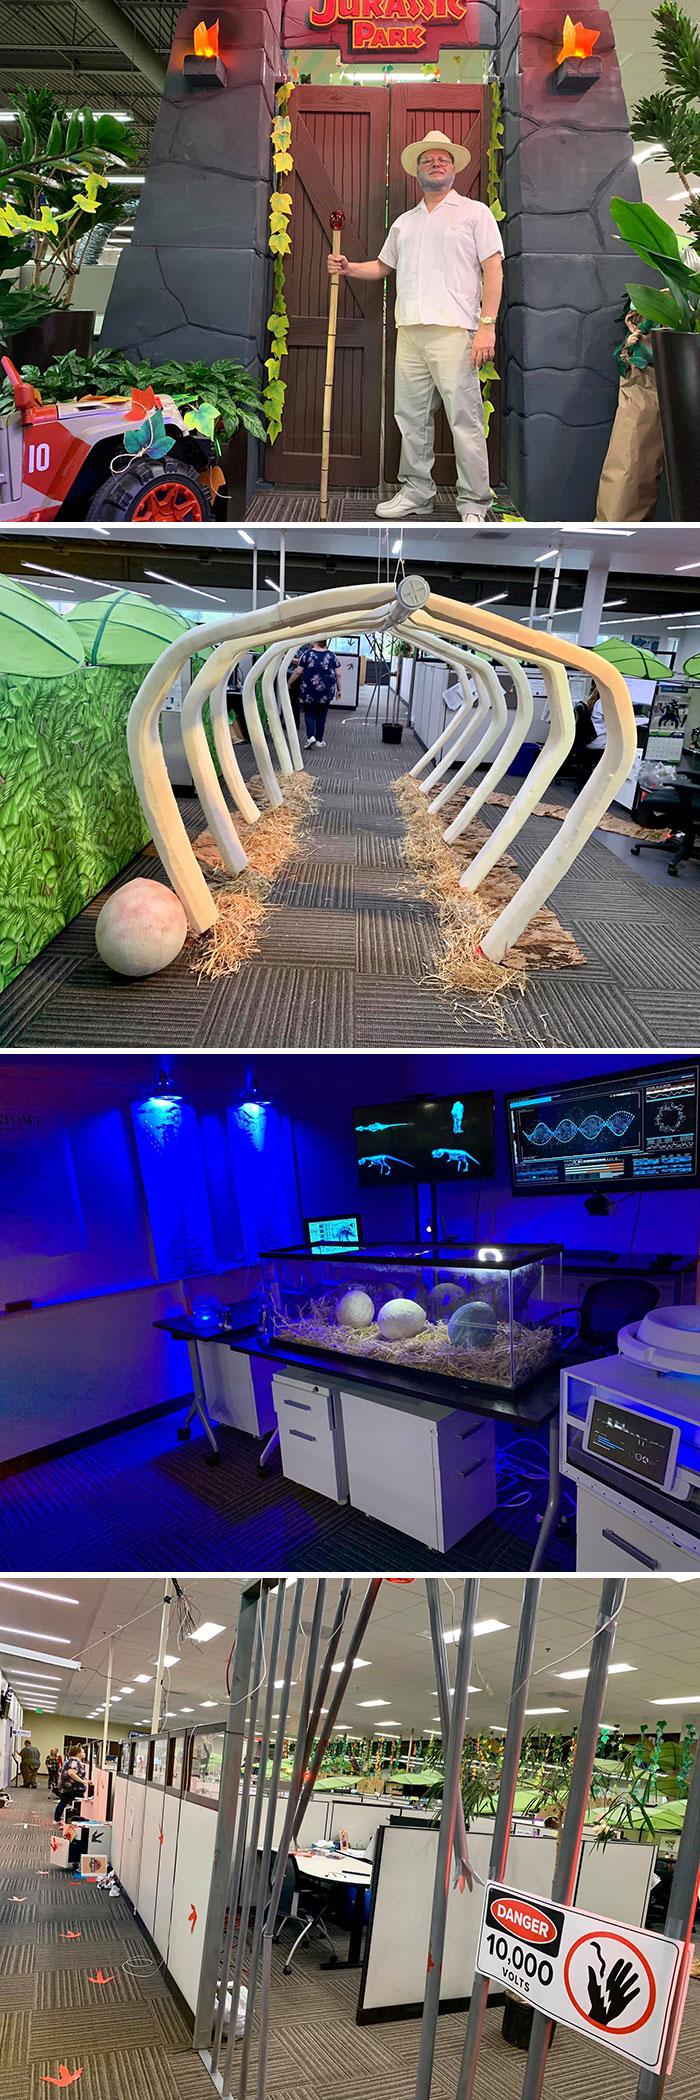 5dbbe5d127e4a creative halloween decorations 118 5db96560d58e0  700 - Americanos levam o Halloween a sério